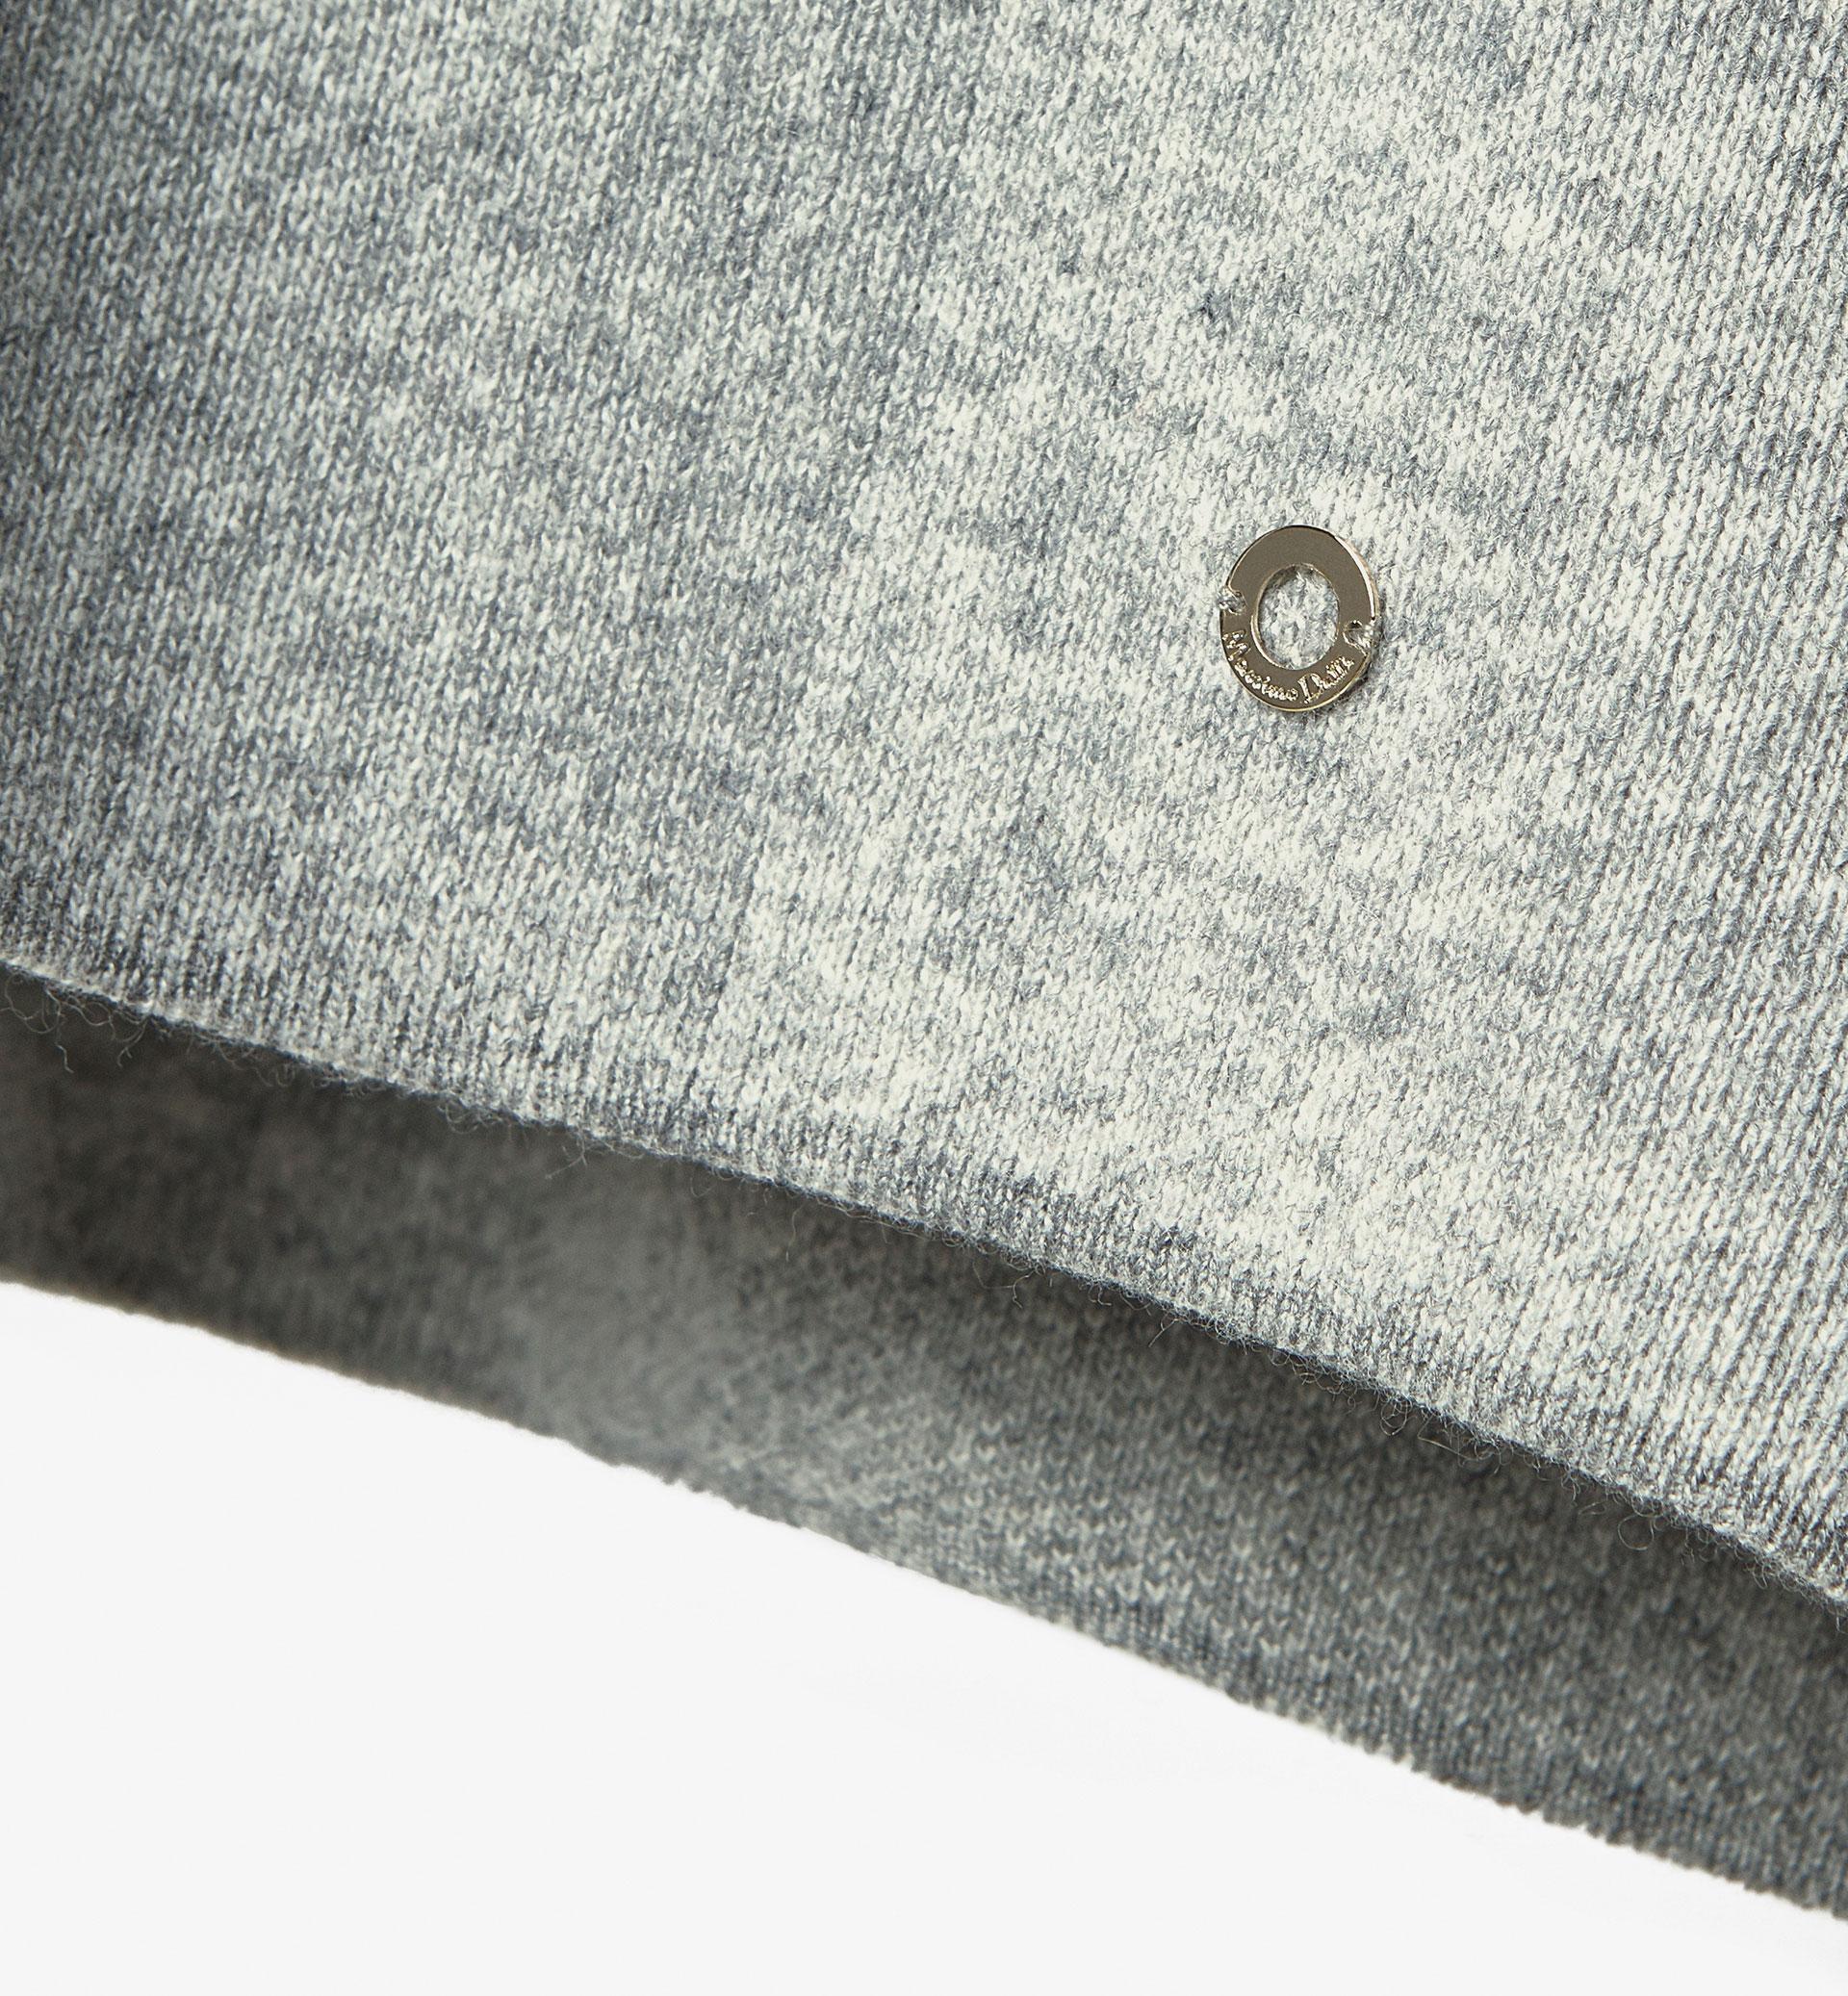 LIMITED EDITION CHECK JACQUARD CAPE